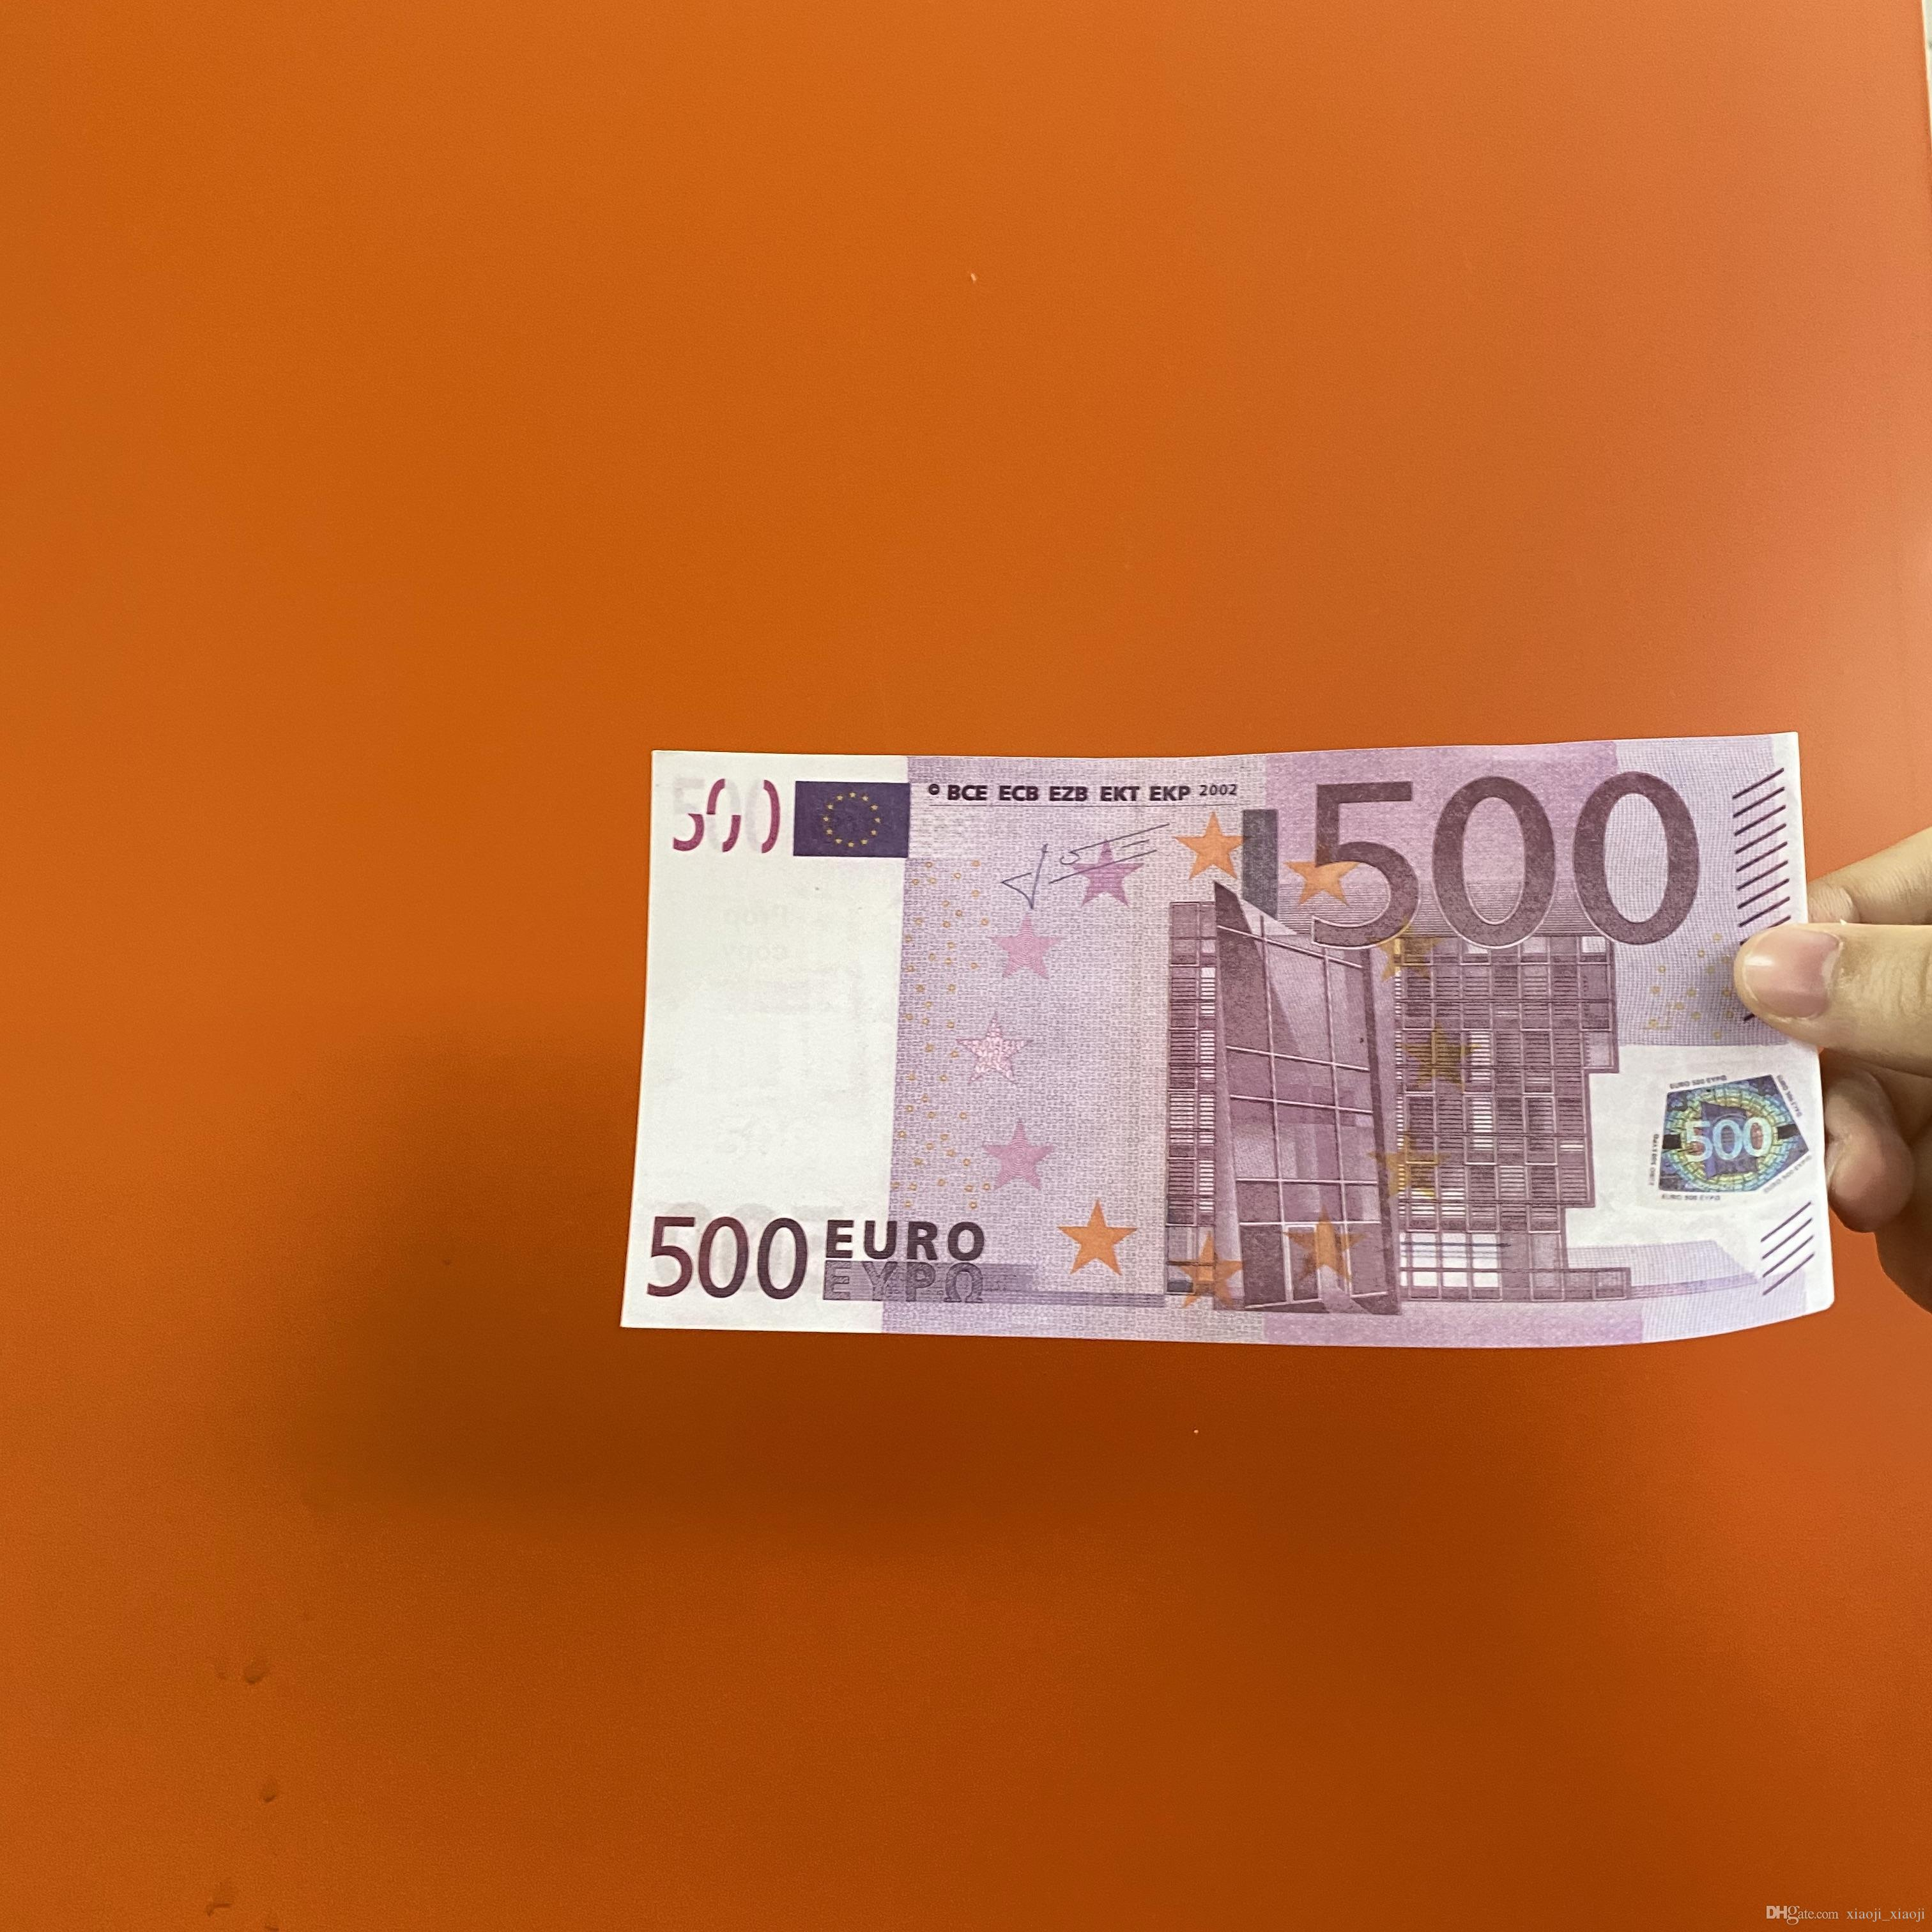 Bar Faux Money Billet Adult 10 Prop 50 Toys Pack Game Euro Fake Money Party Children's 20 100 500 100pcs 200 Omjcd